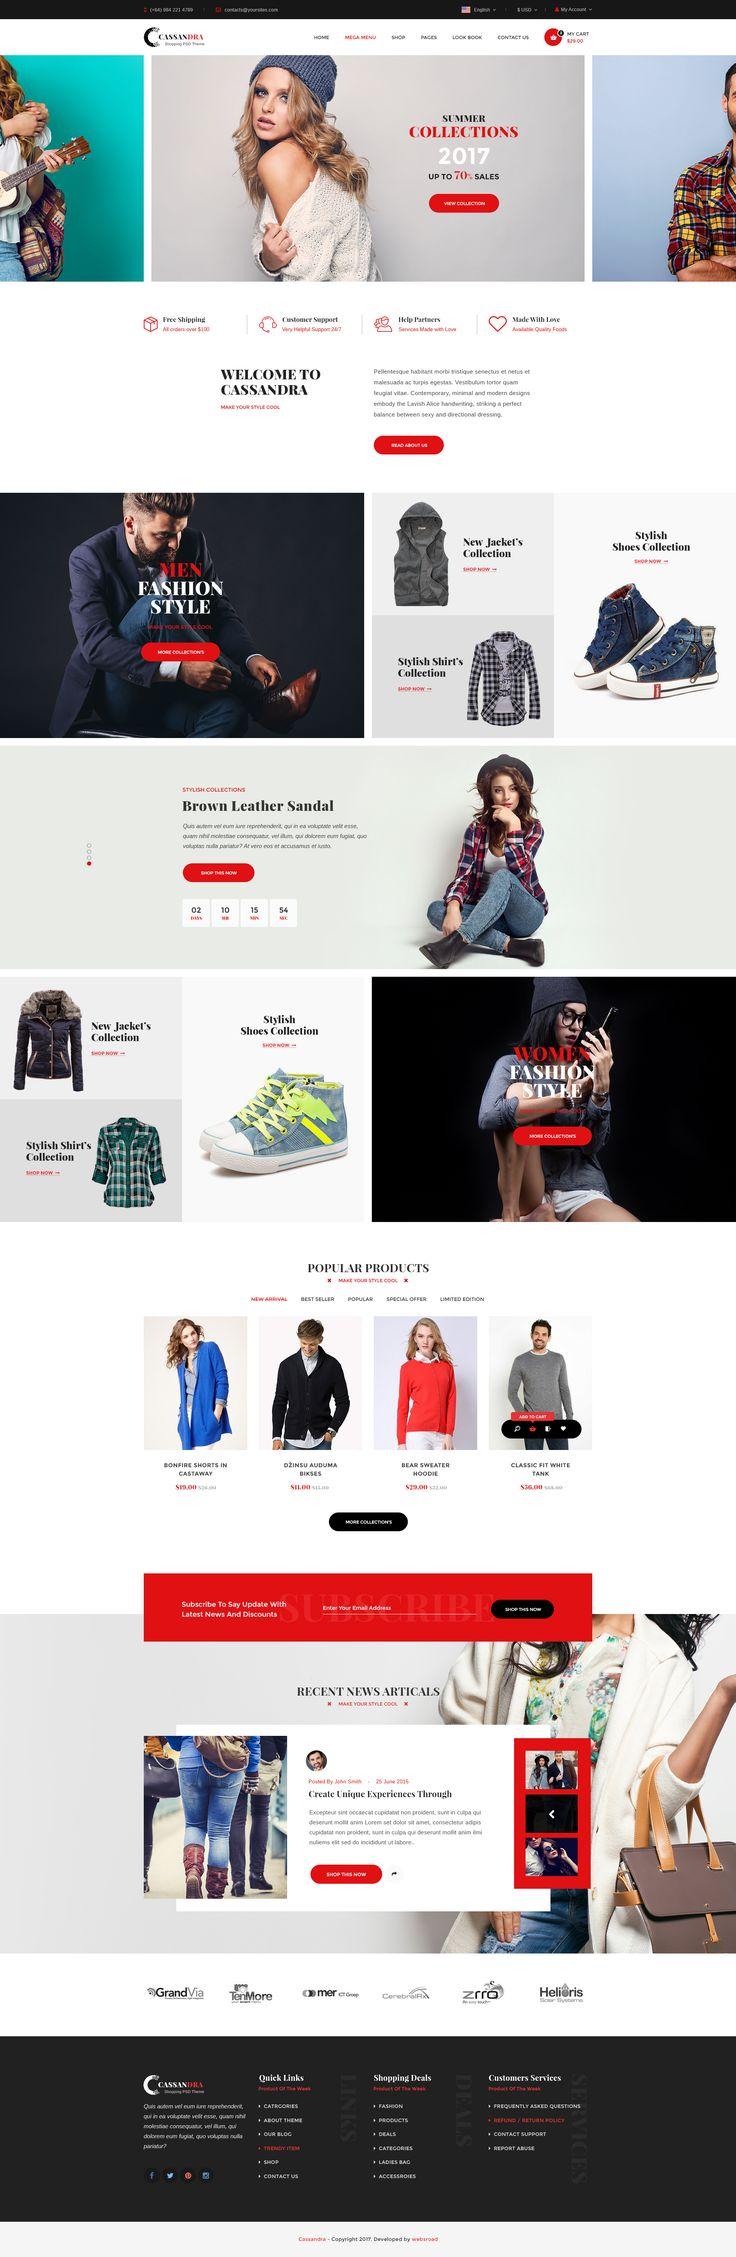 Cassandra Shopping – multipurpose e-commerce PSD template #online shop #organic #retail • Download ➝ https://themeforest.net/item/cassandra-shopping-multipurpose-ecommerce-psd-template/19498969?ref=pxcr